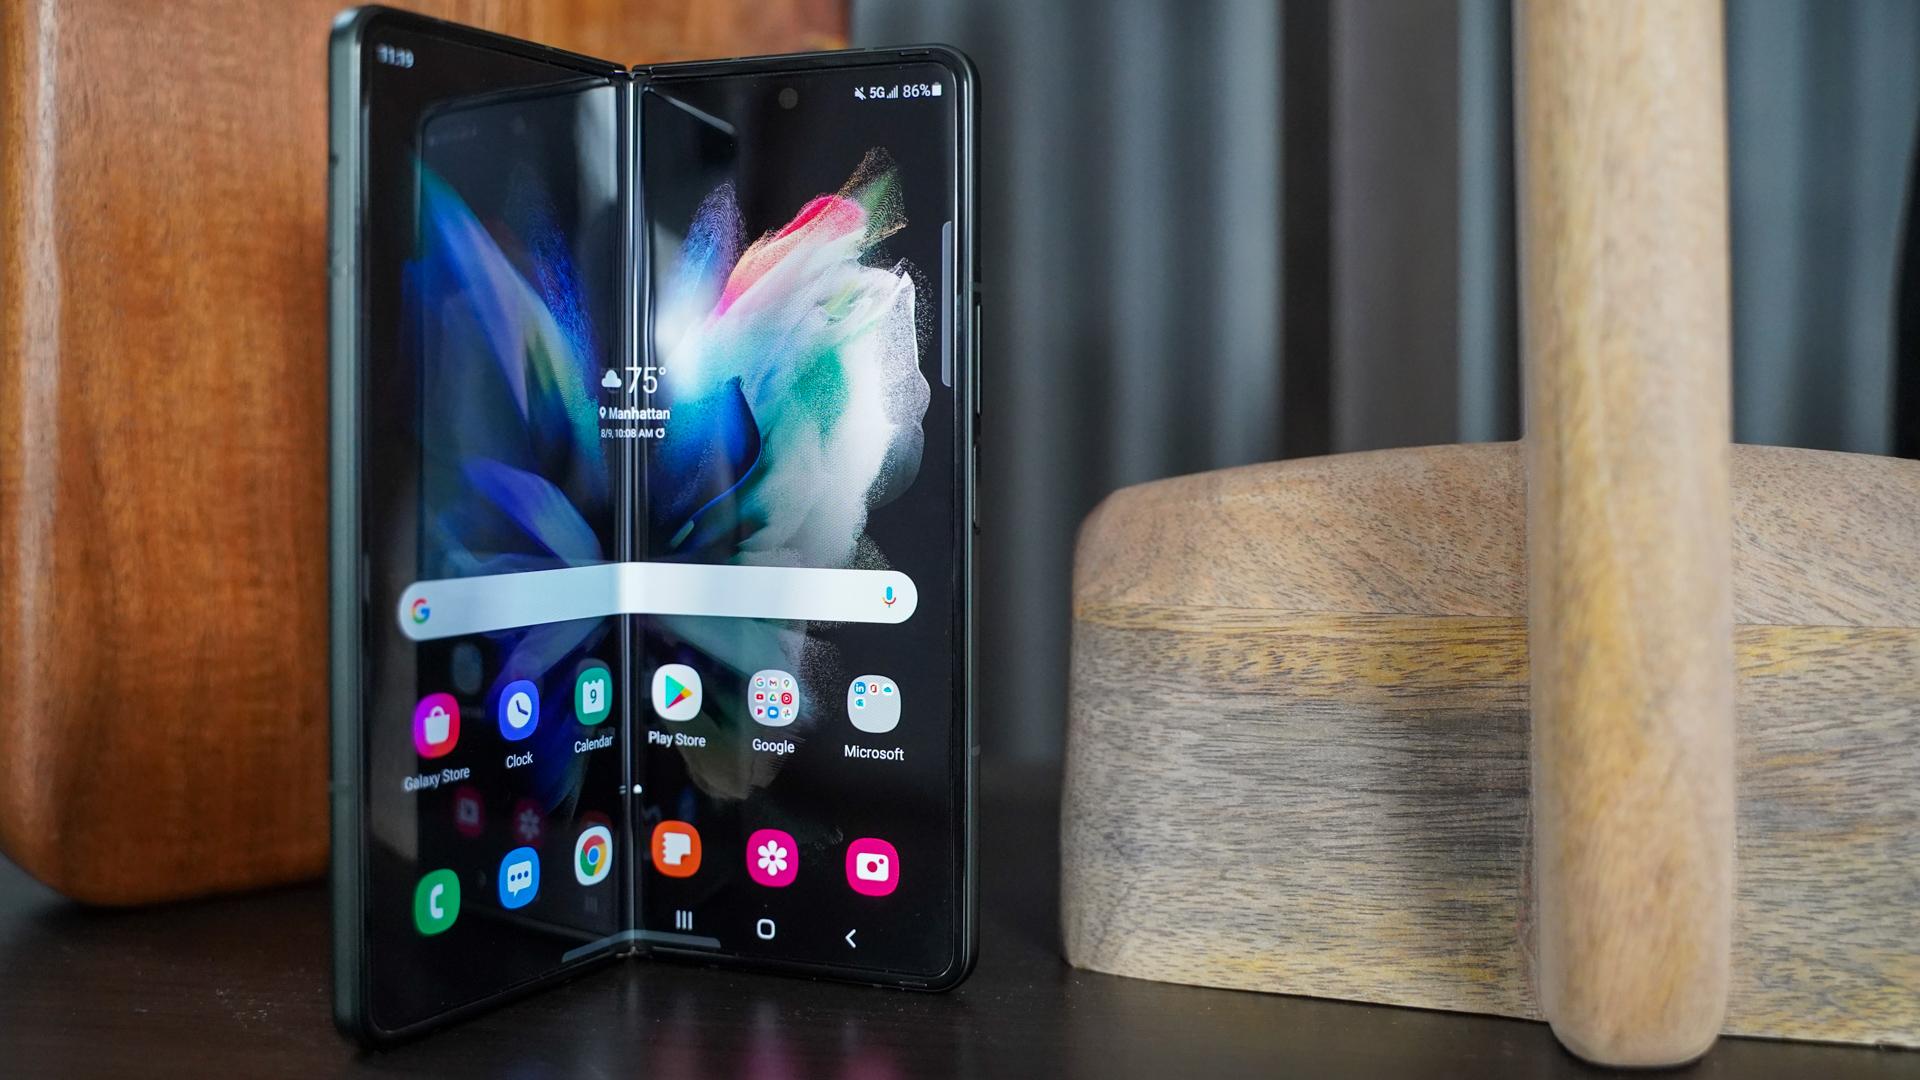 The Galaxy Z Fold 3 has its fair share of